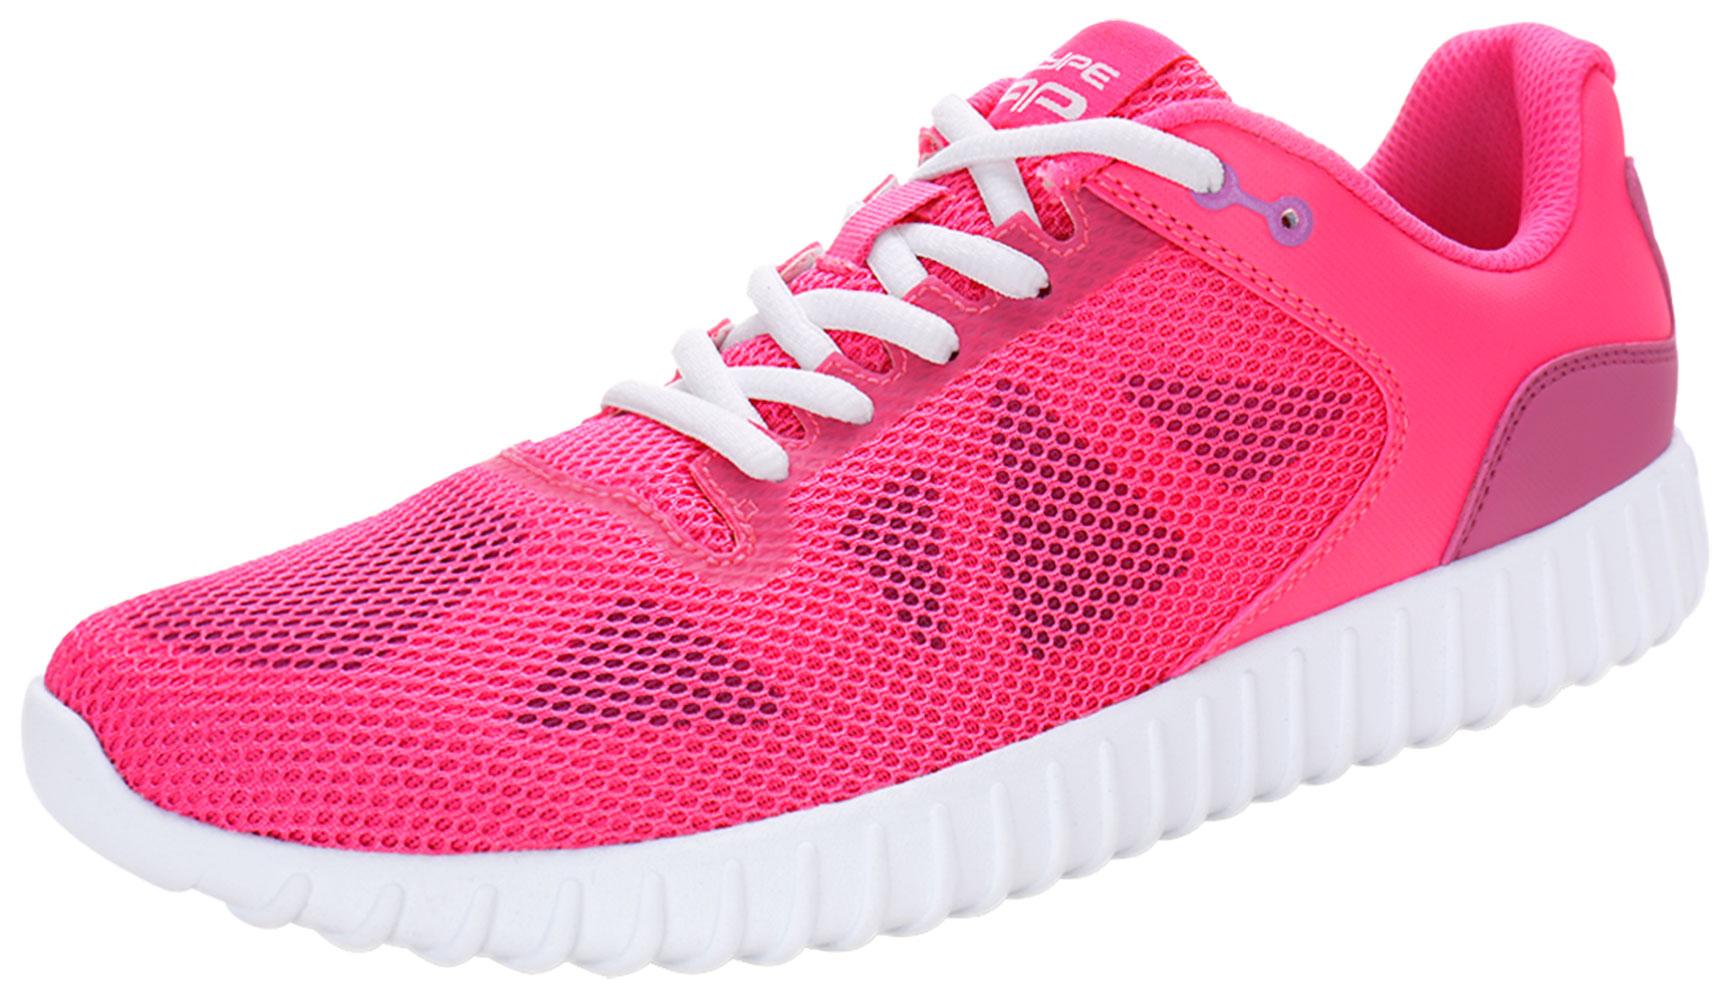 PYPE Women Geometric Prints Lace Up Mesh Training Shoes Pink US 9.5